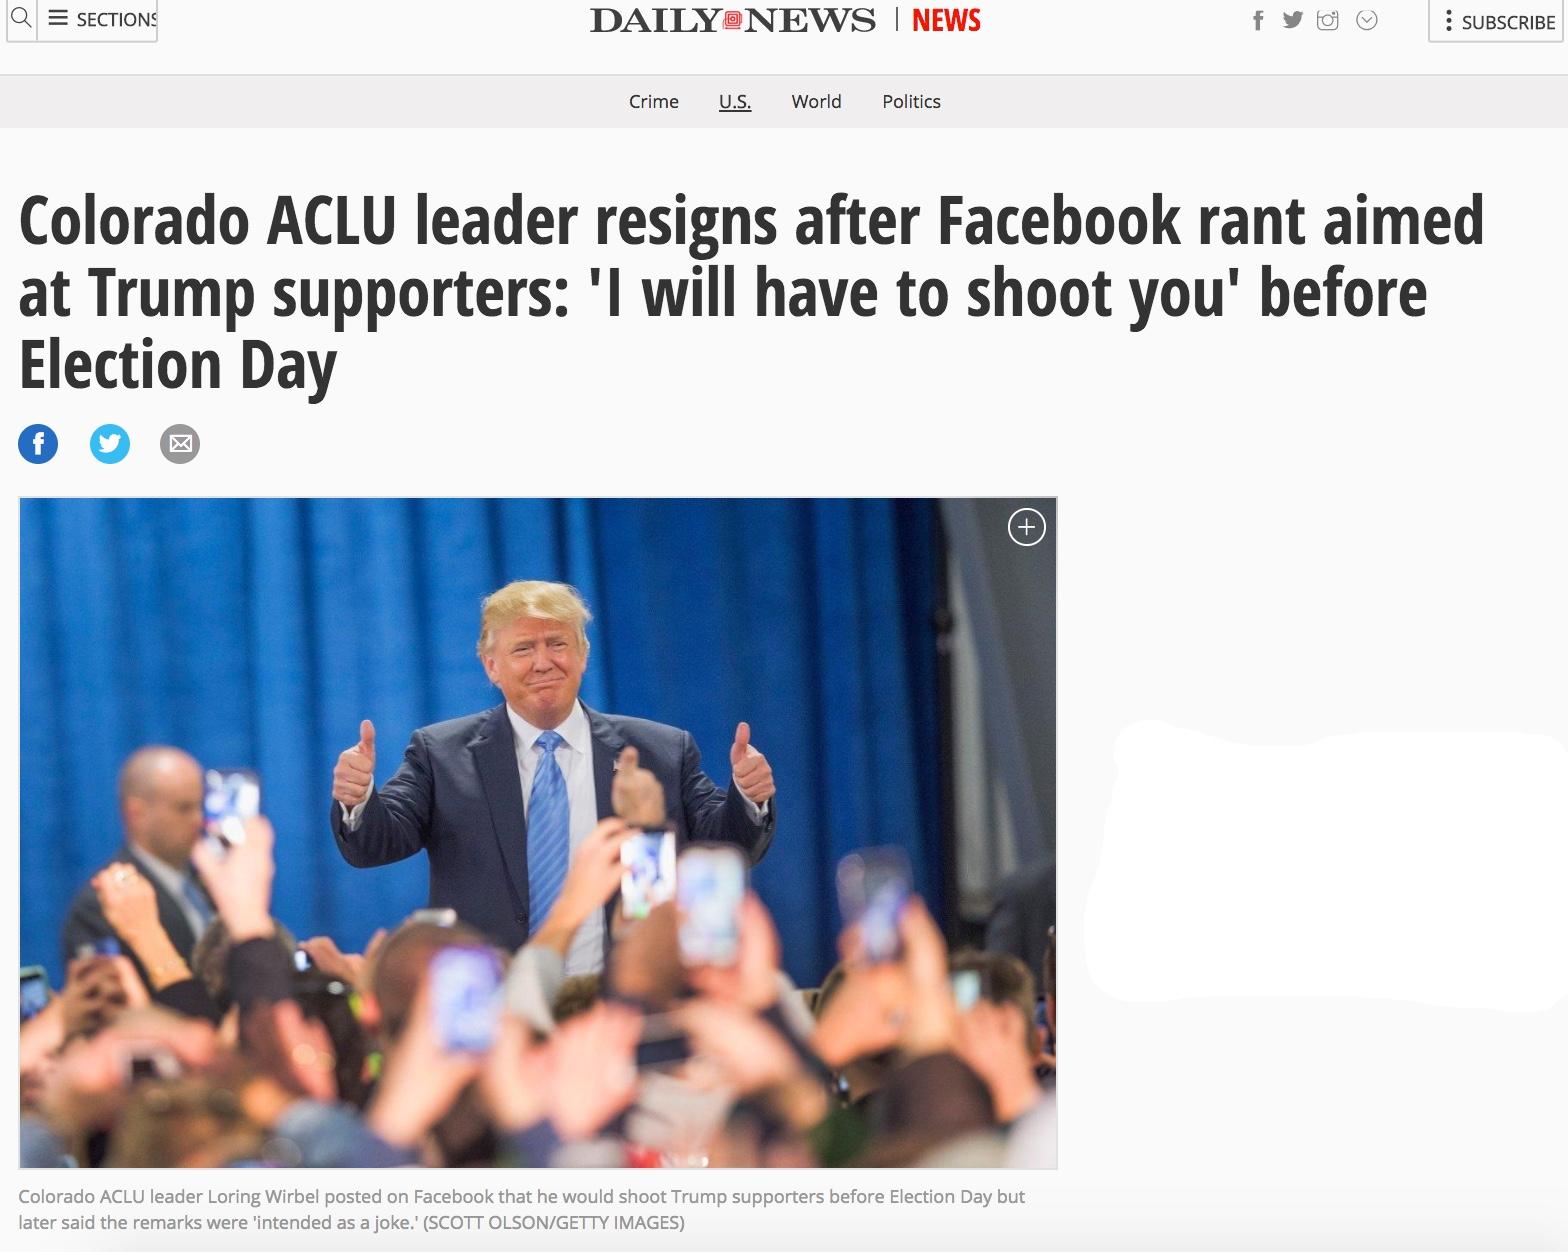 ACLU Trump Threats